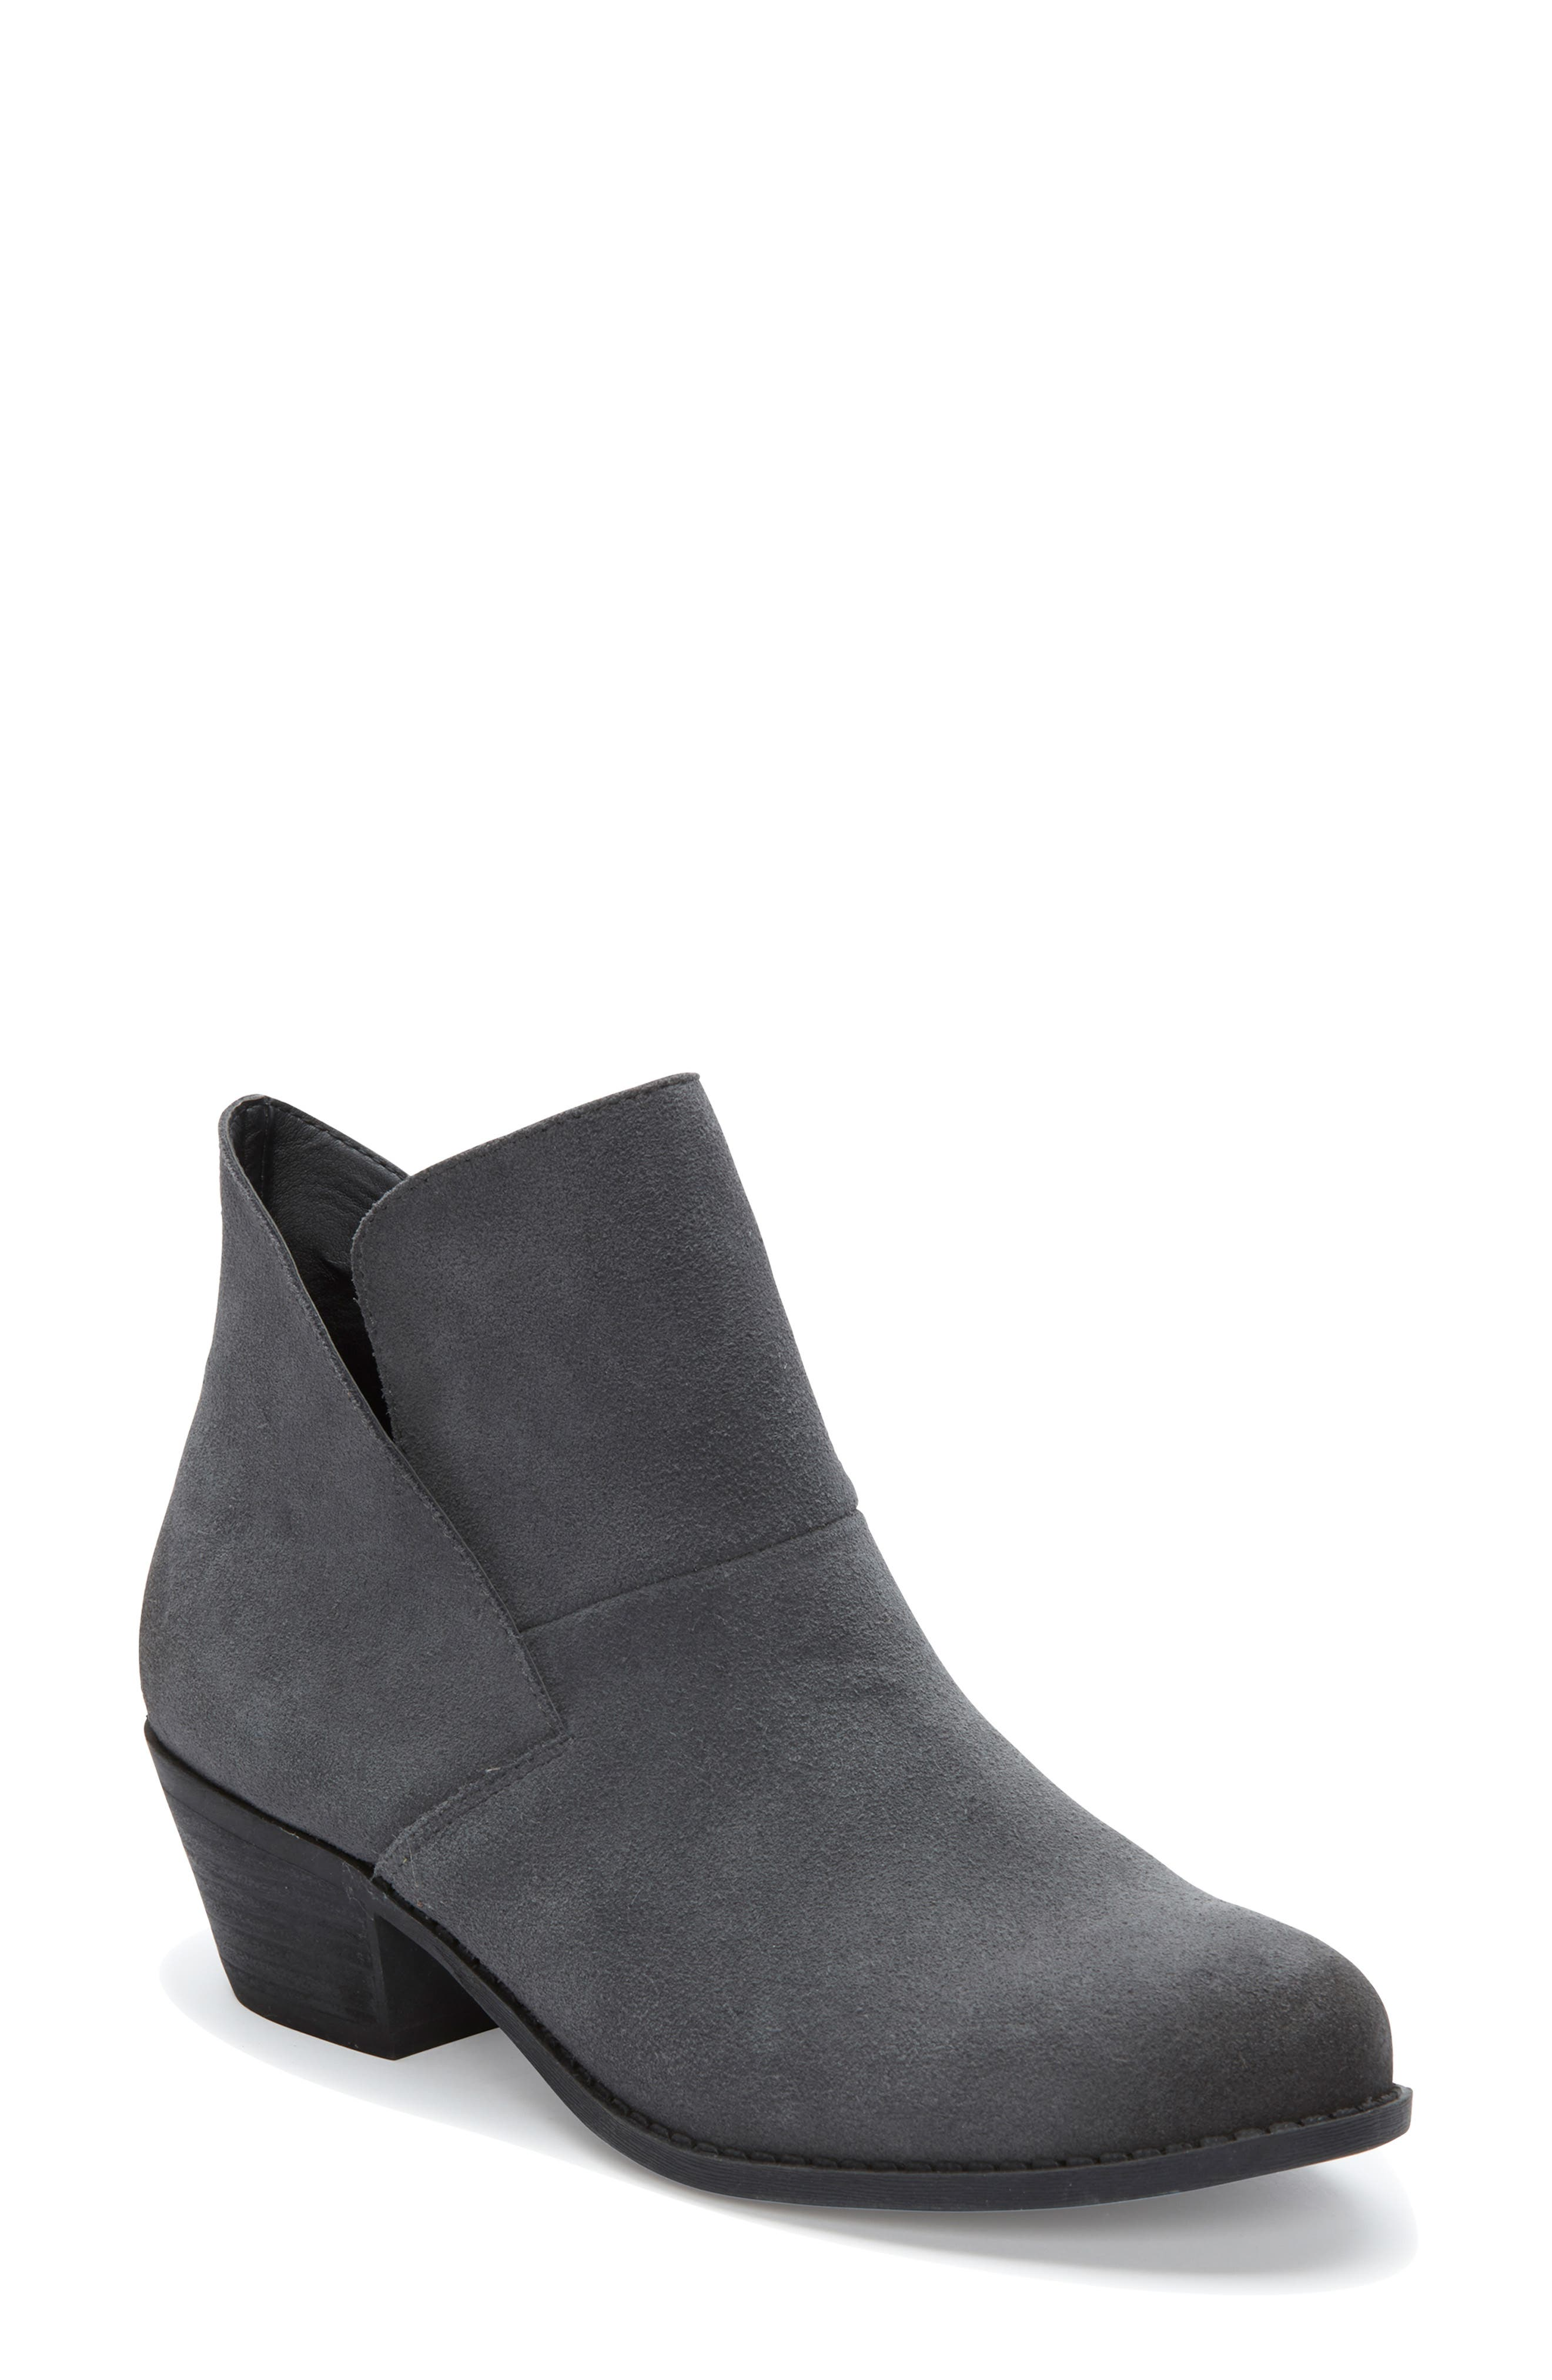 Me Too Zena Ankle Boot- Grey